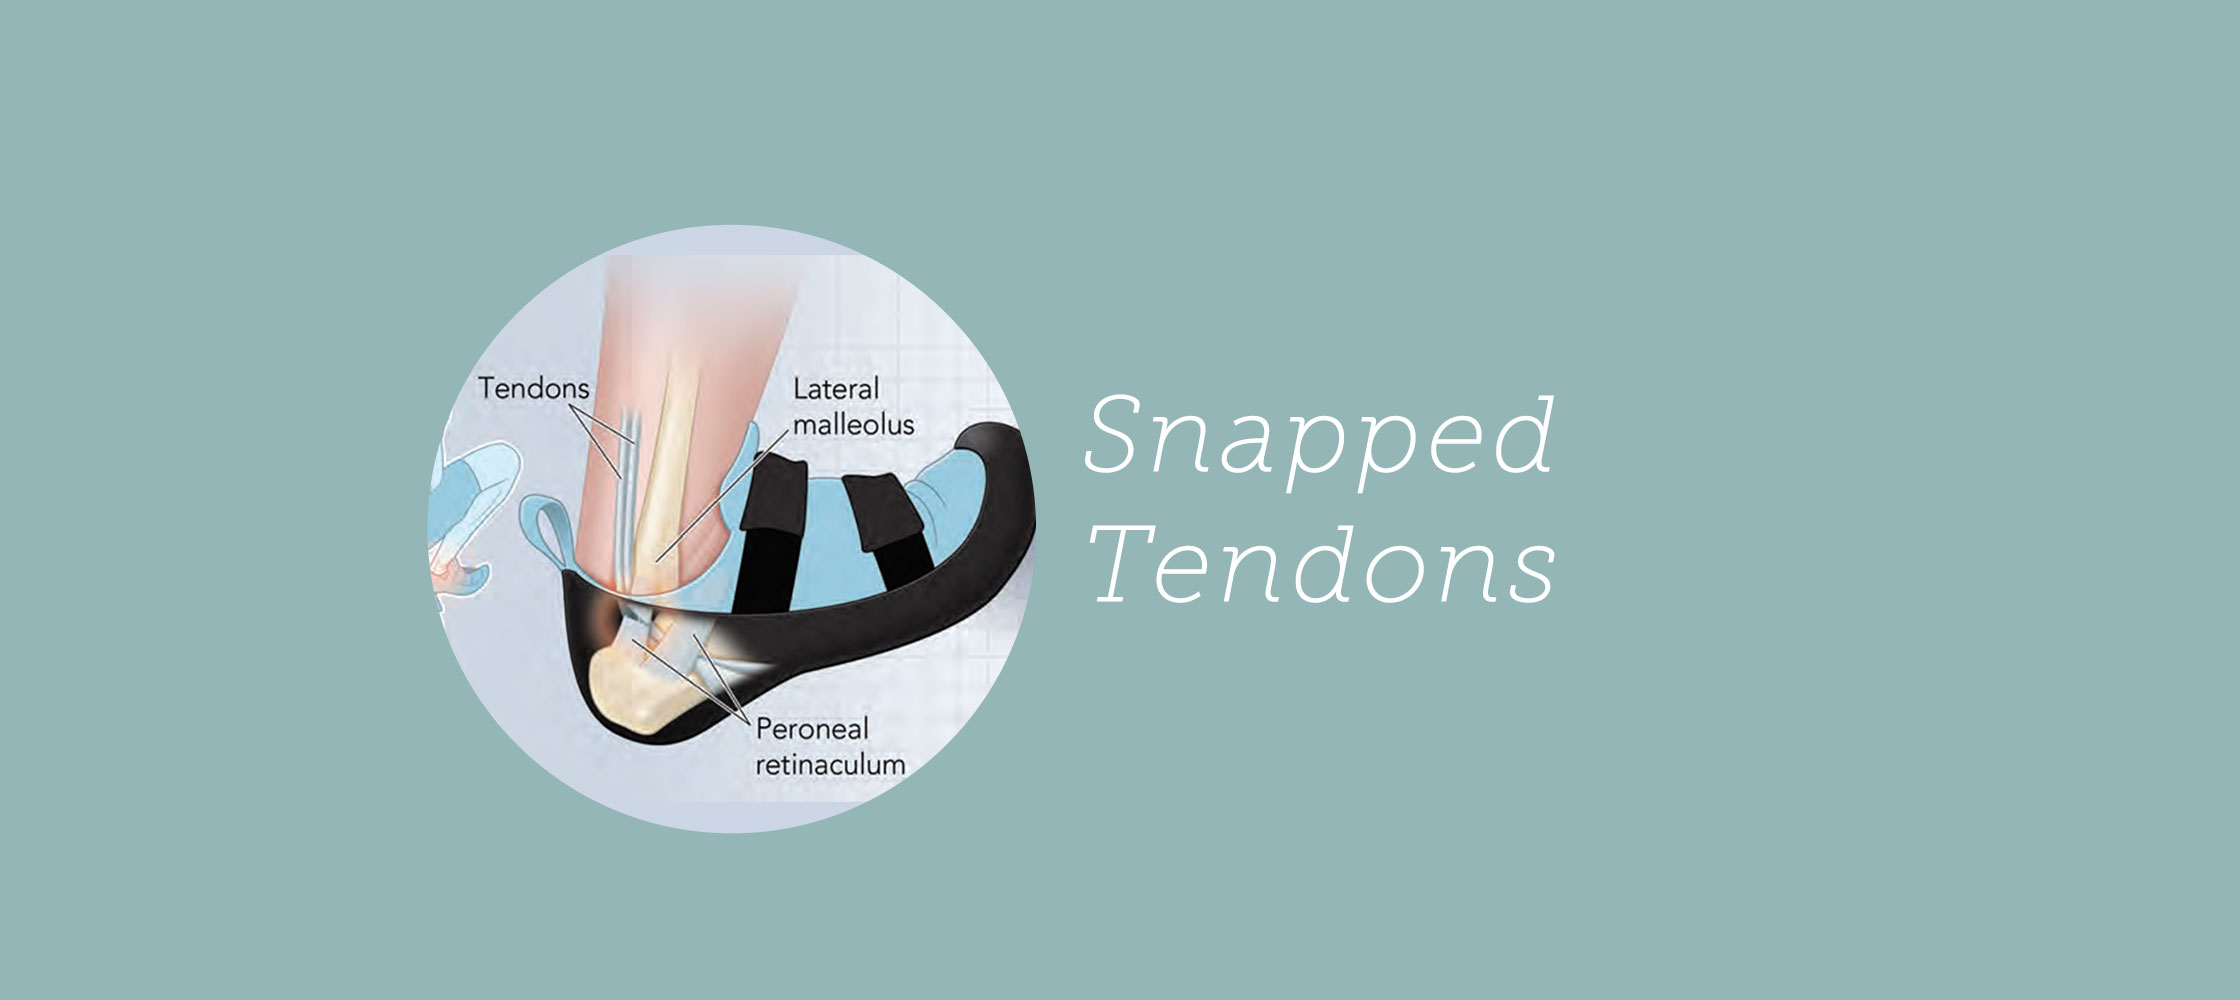 SnappedTendons